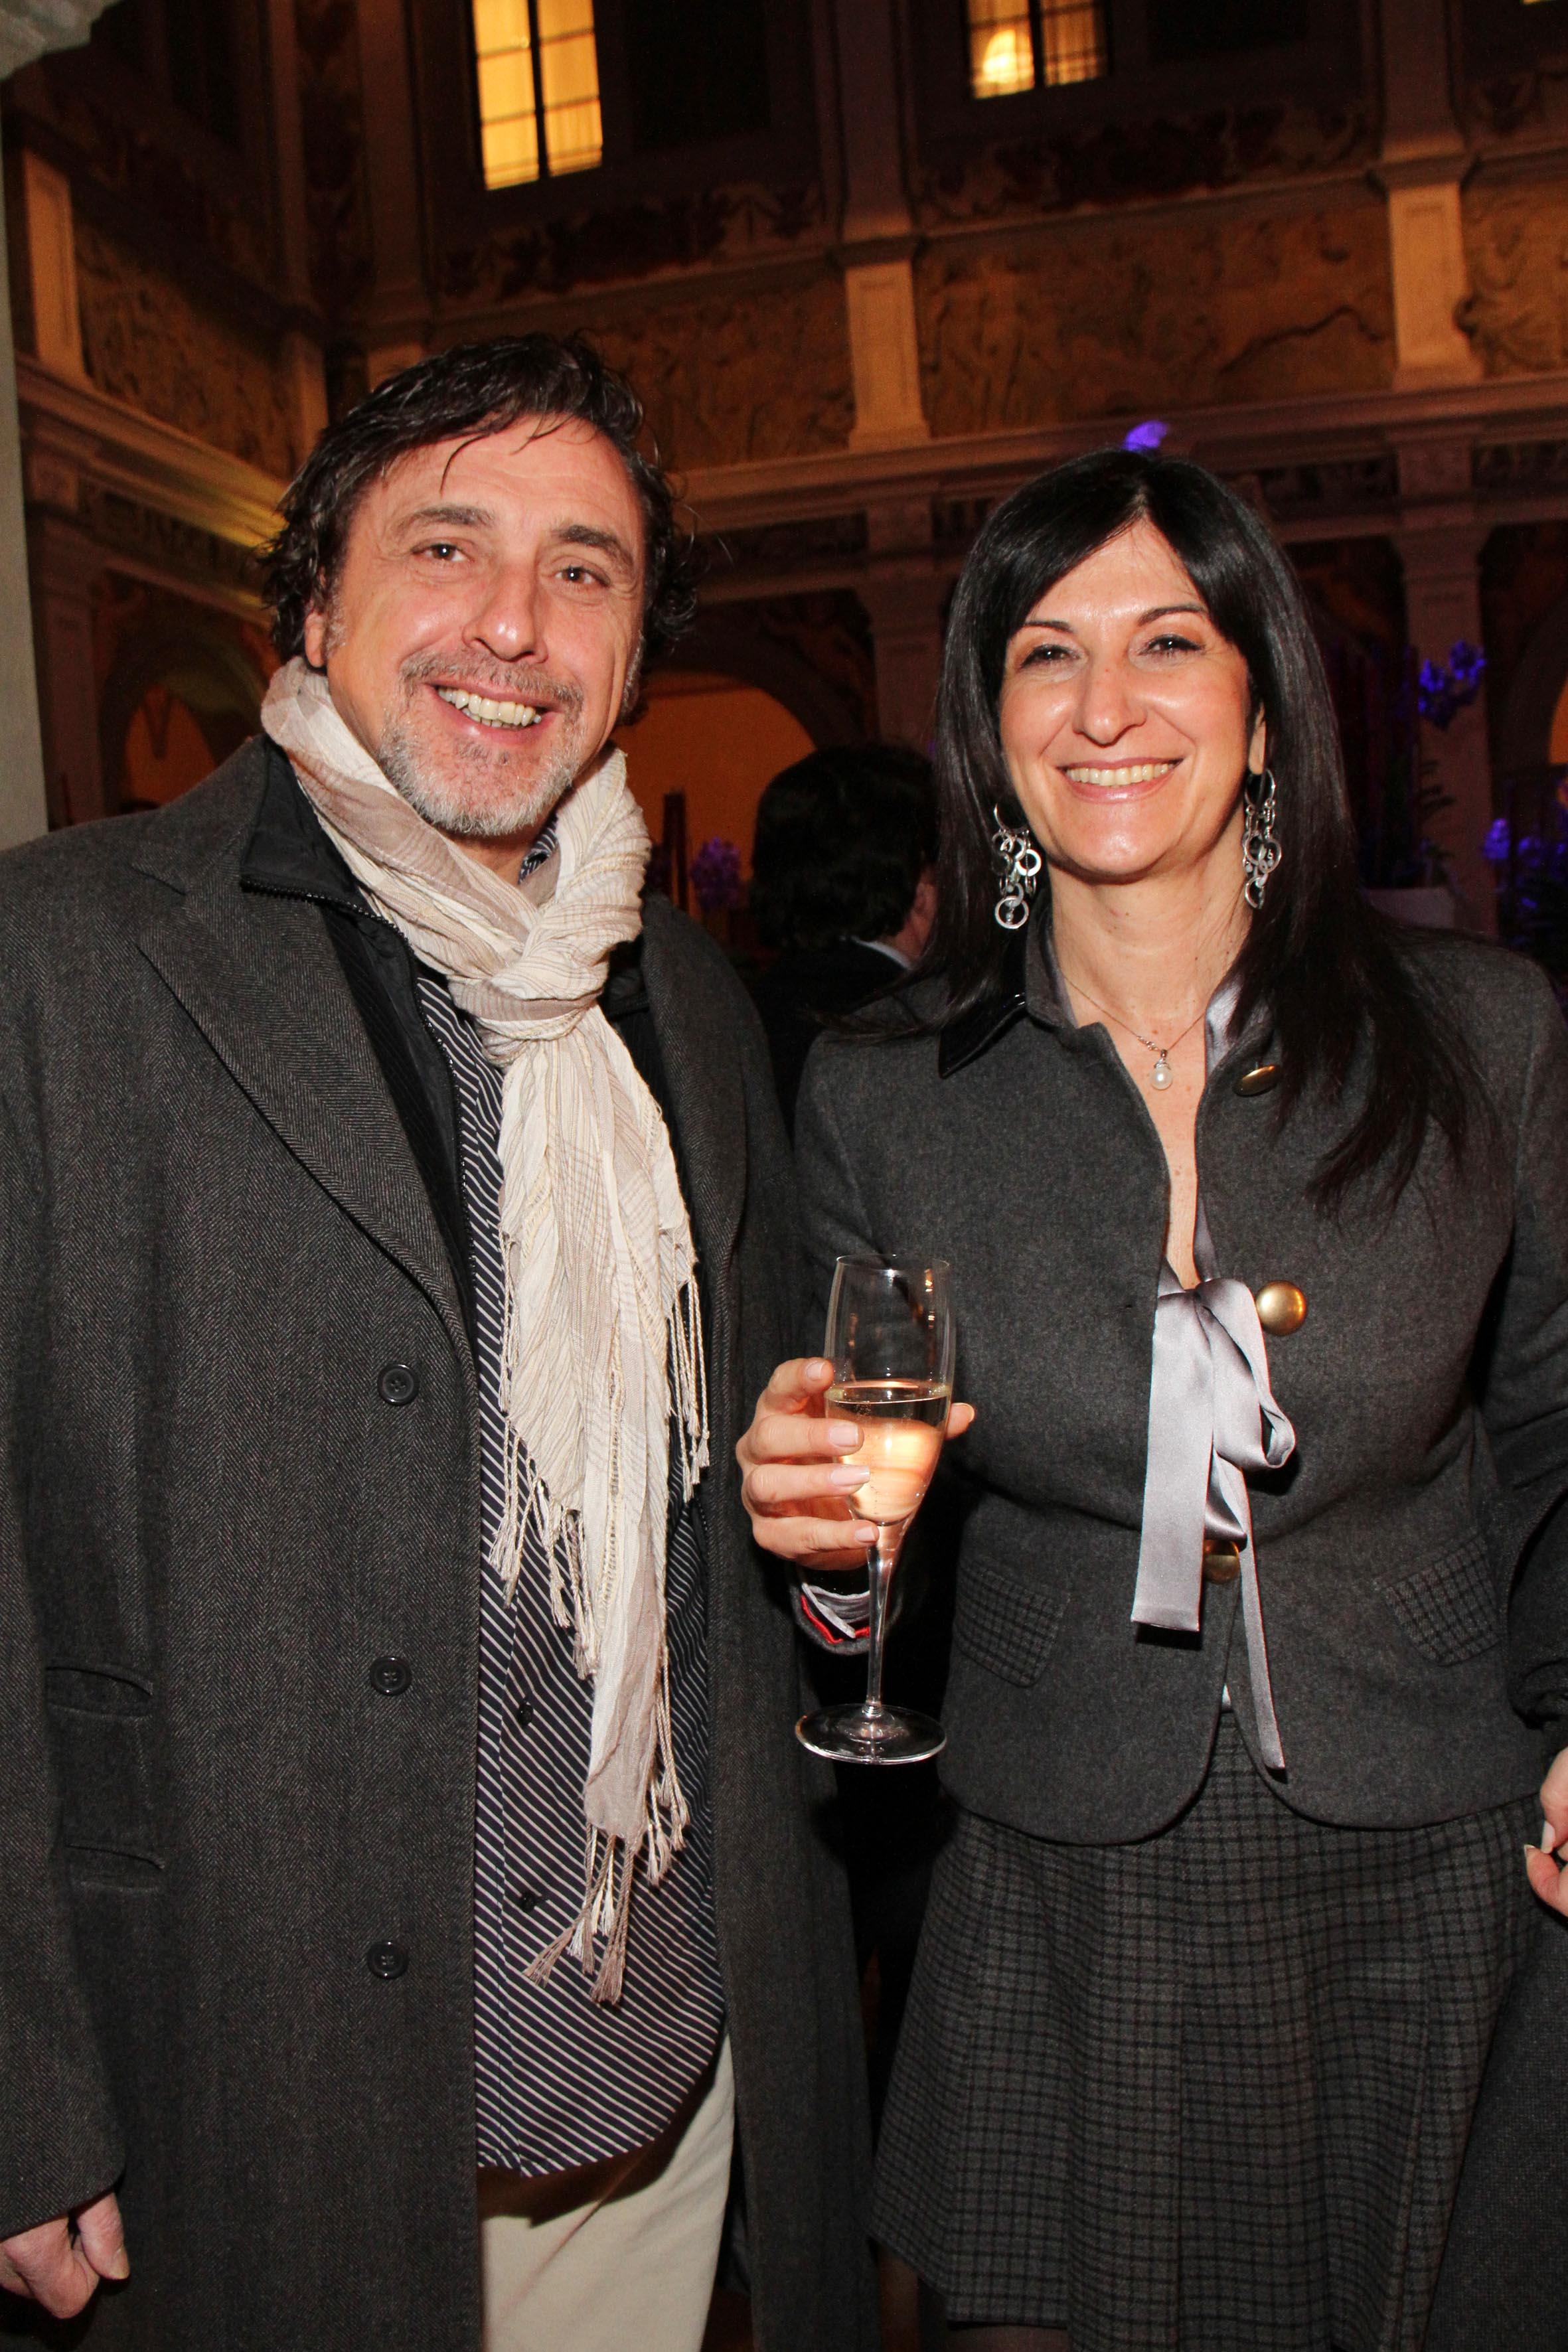 PRESSPHOTO Firenze,  Four Seasons, evento Metropolitan. Nella foto Donatella Stivoli, Riccardo Becattelli  foto Giuseppe Cabras/New Press Photo